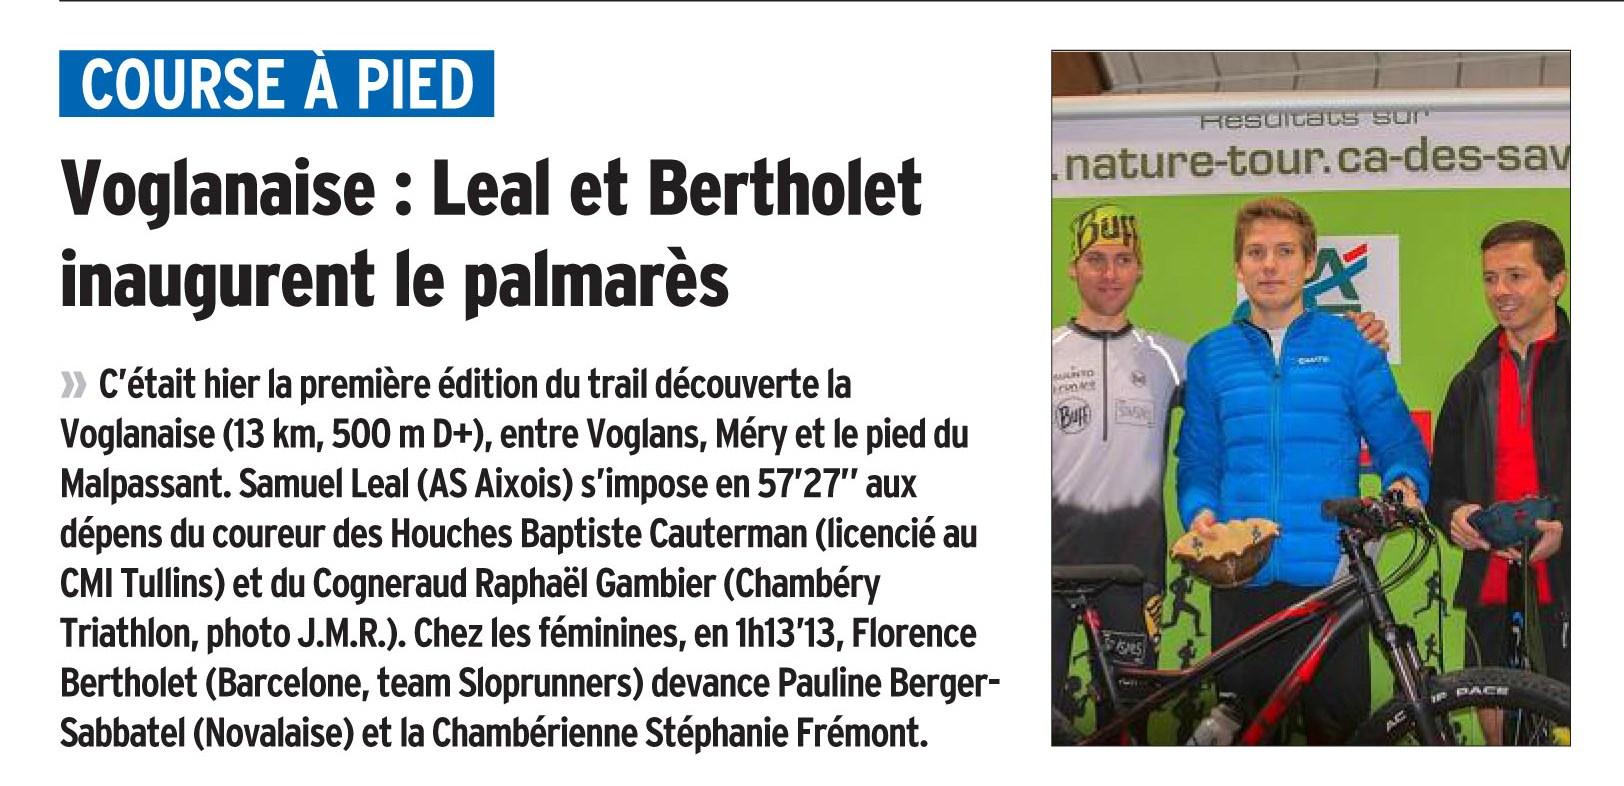 PDF Page 34 edition de chambery 20140505web3 - Résultats du trail Nivolet-Revard 2014 (Voglans73)